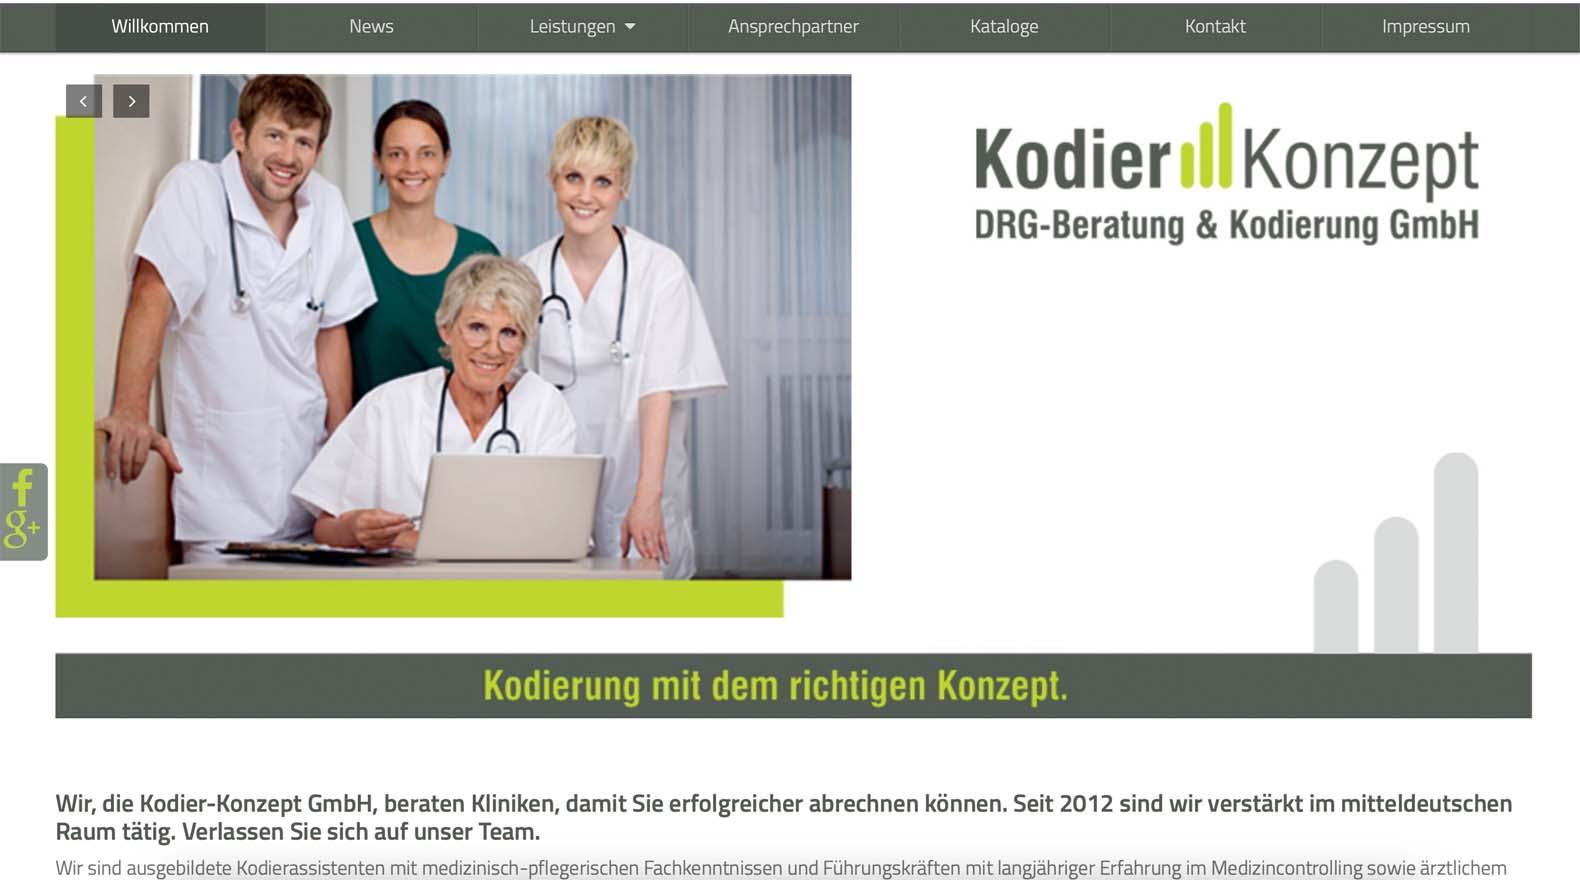 webprojekt-chemnitz-kopierkonzept